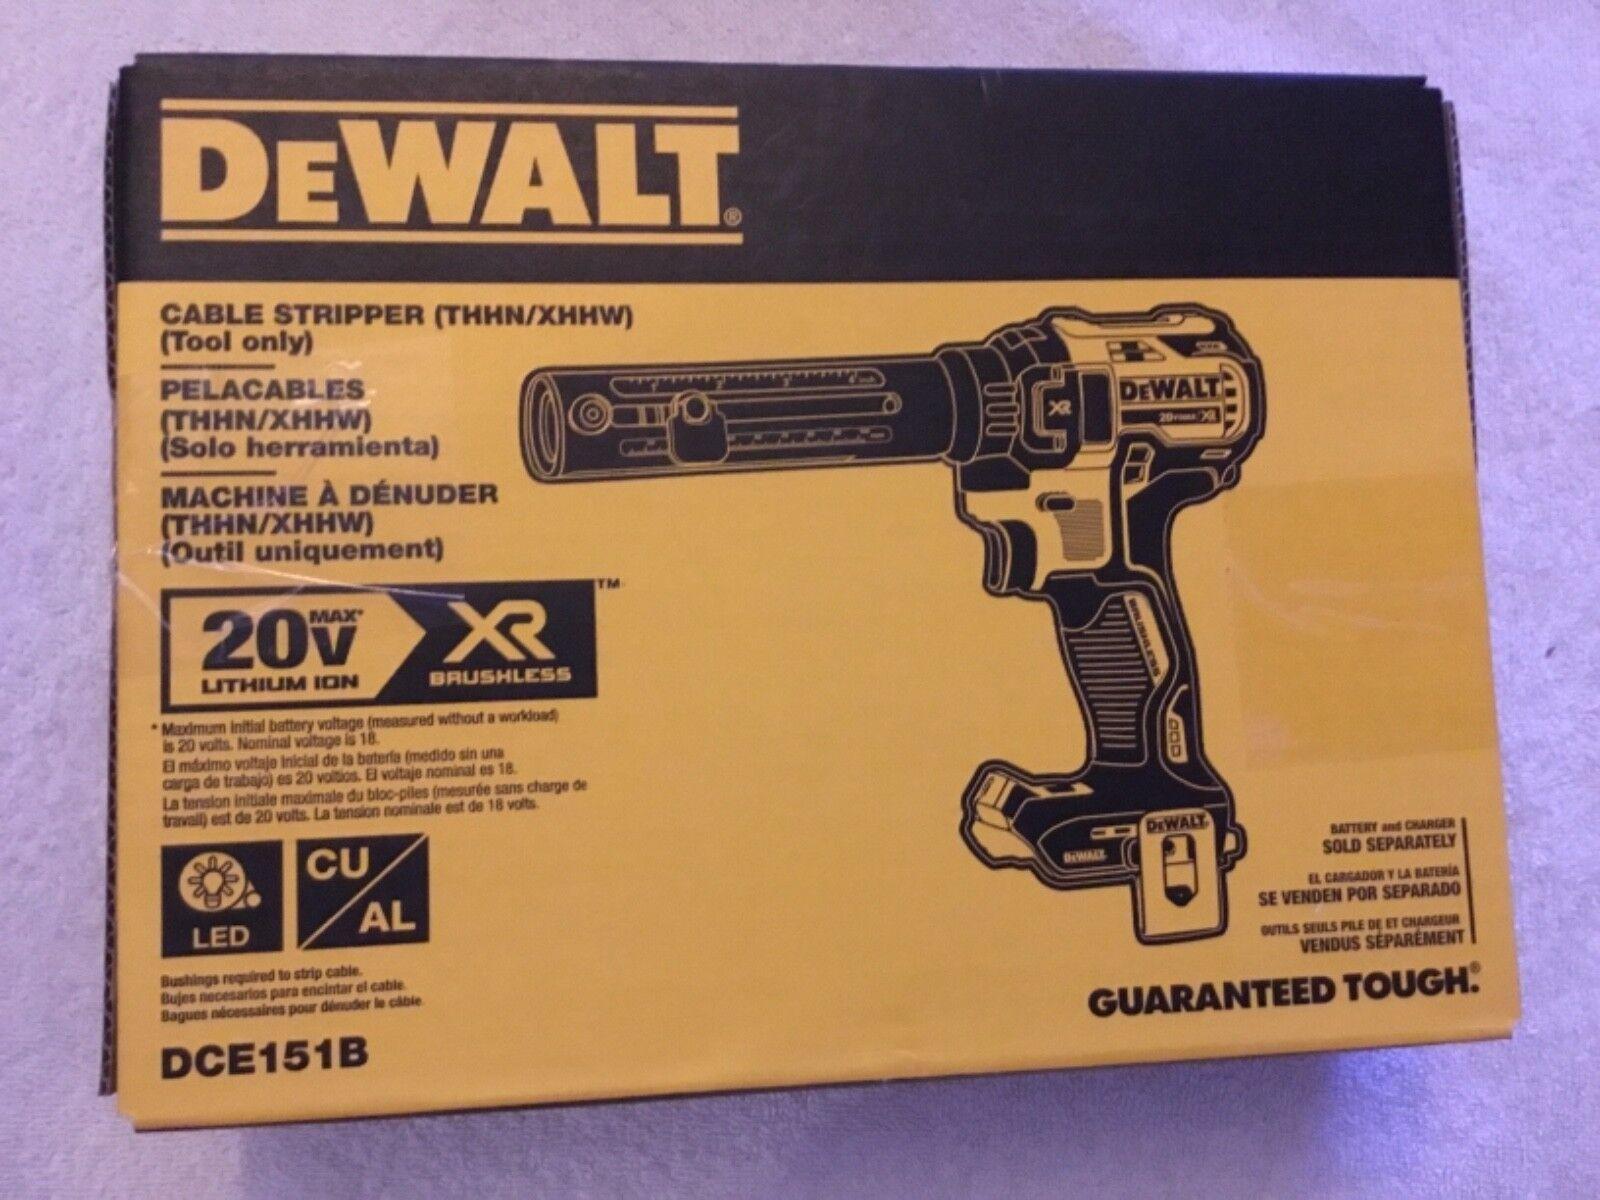 New Dewalt DCE151B 20V 20 Volt Max XR Cordless Brushless Cable Stripper (NIB)